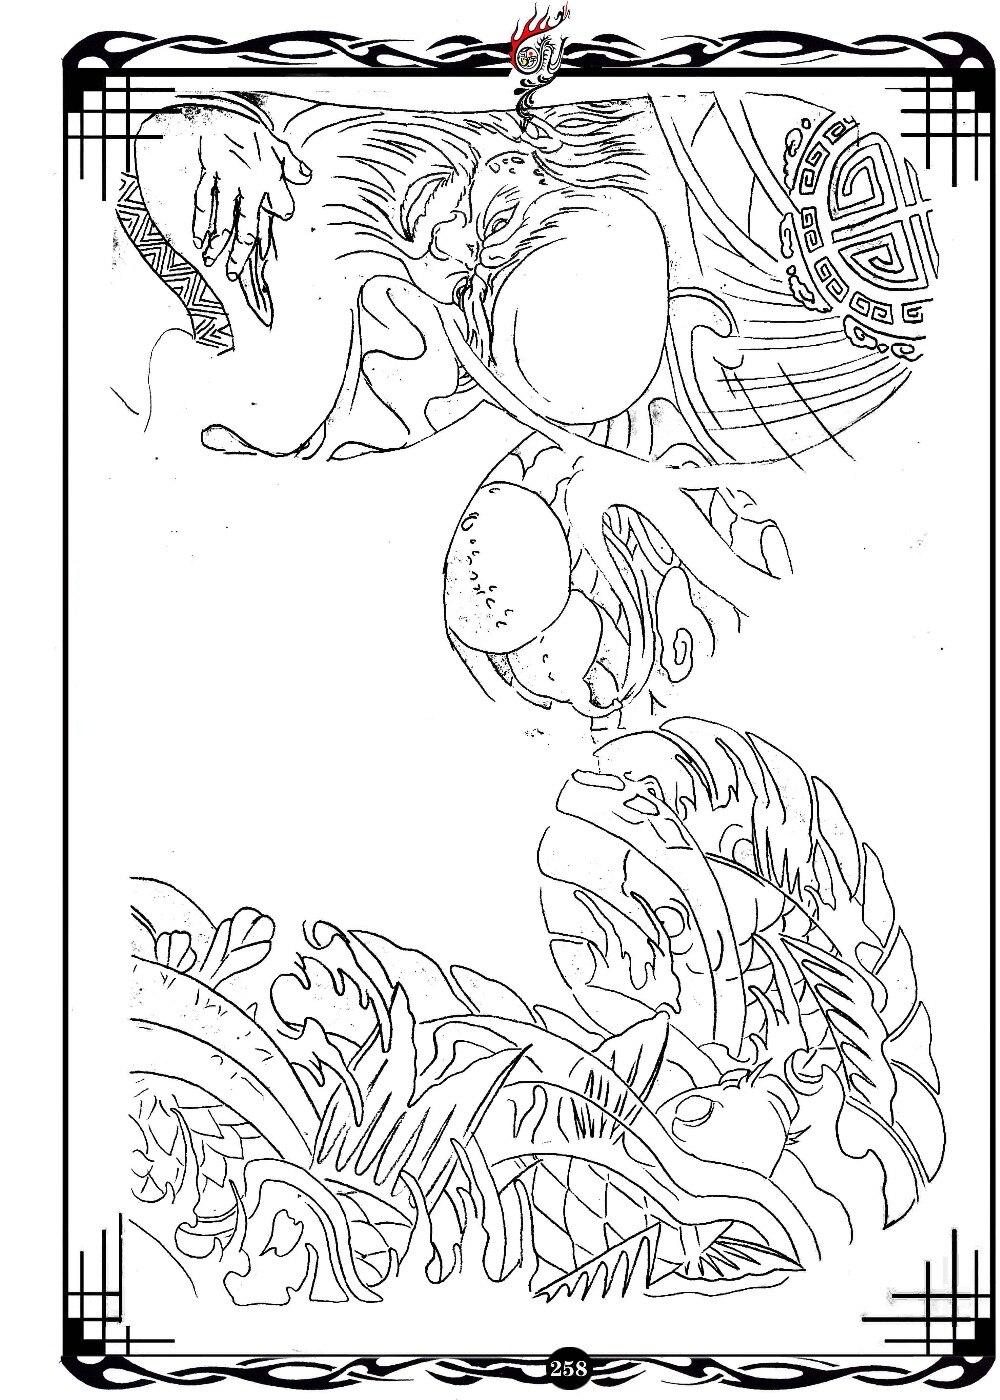 pdf format tattoo book traditional tattoo 49 pgs flower pattern kind of skull tattoo flash tattoo designs sketch free shipping in tattoo stencils from - Tattoo Coloring Book Pdf